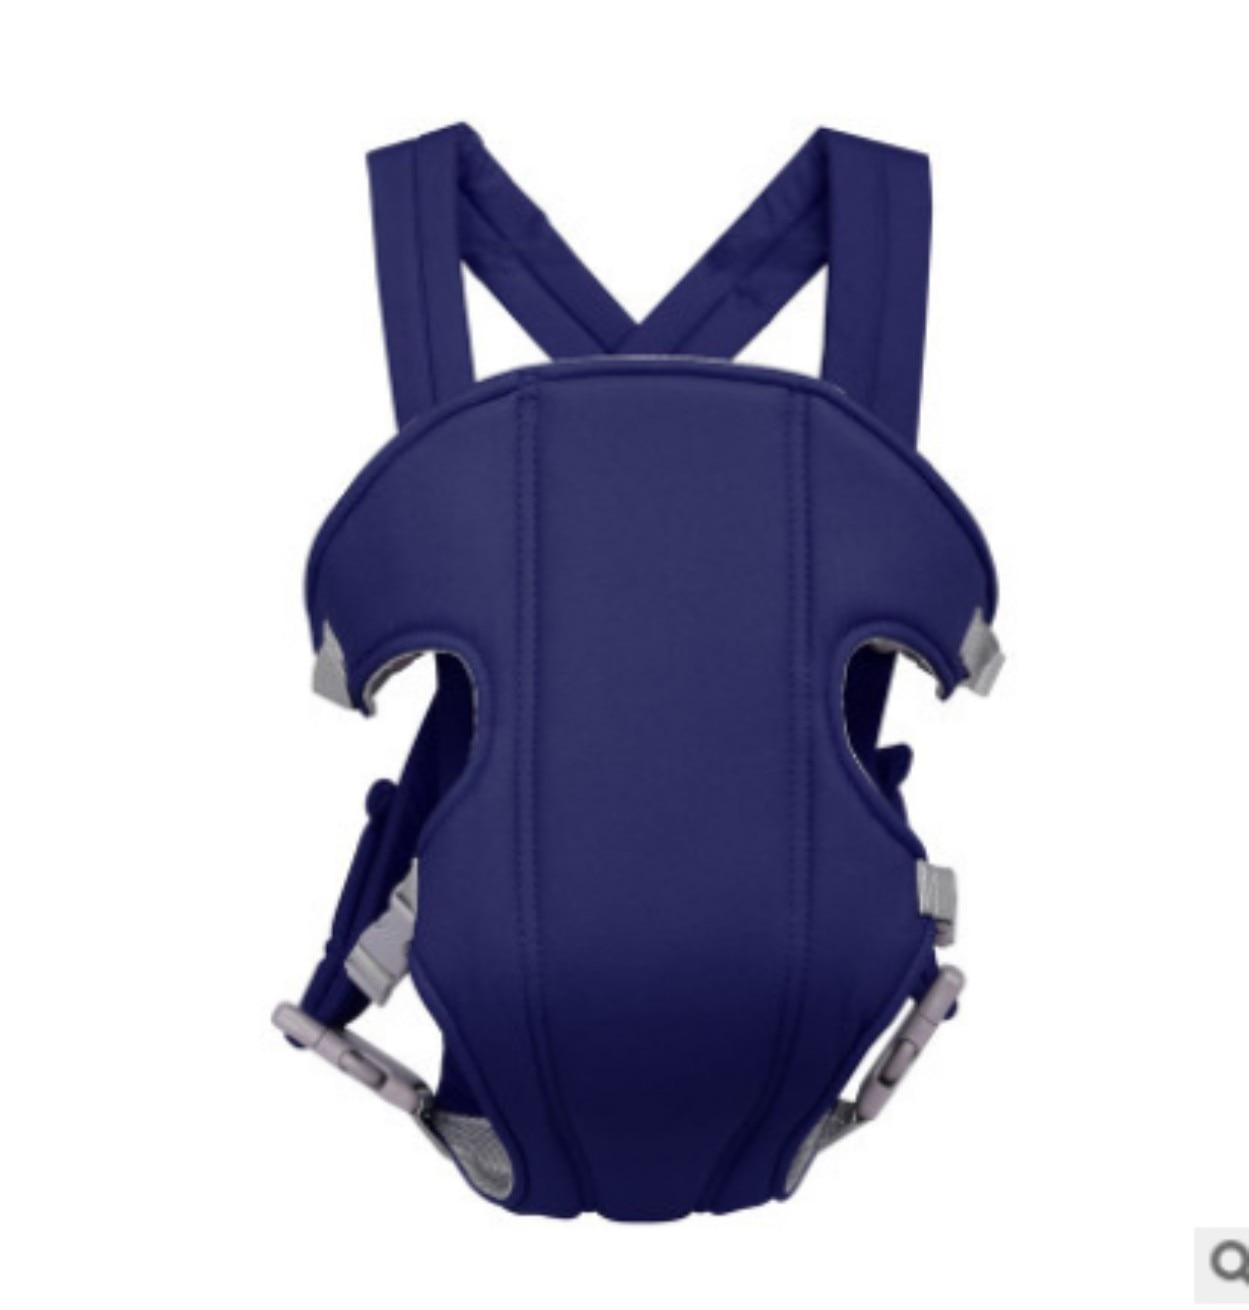 Pudcoco Adjustable Infant Baby Carrier Wrap Sling Newborn Backpack Breathable Ergonomic Multifunction Outdoor Kangaroo